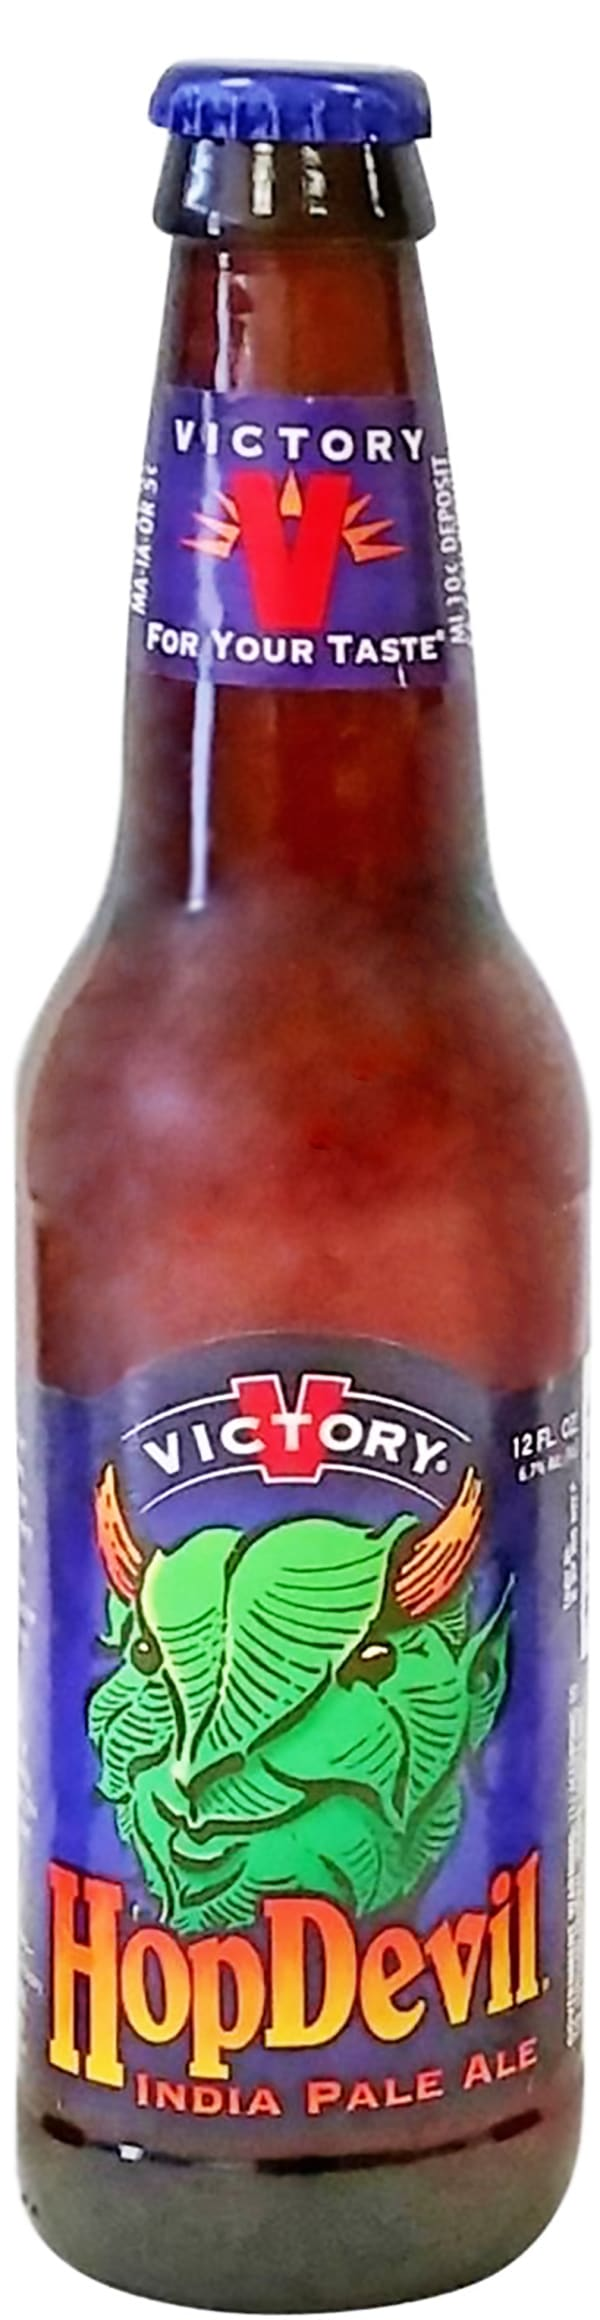 HopDevil India Pale Ale